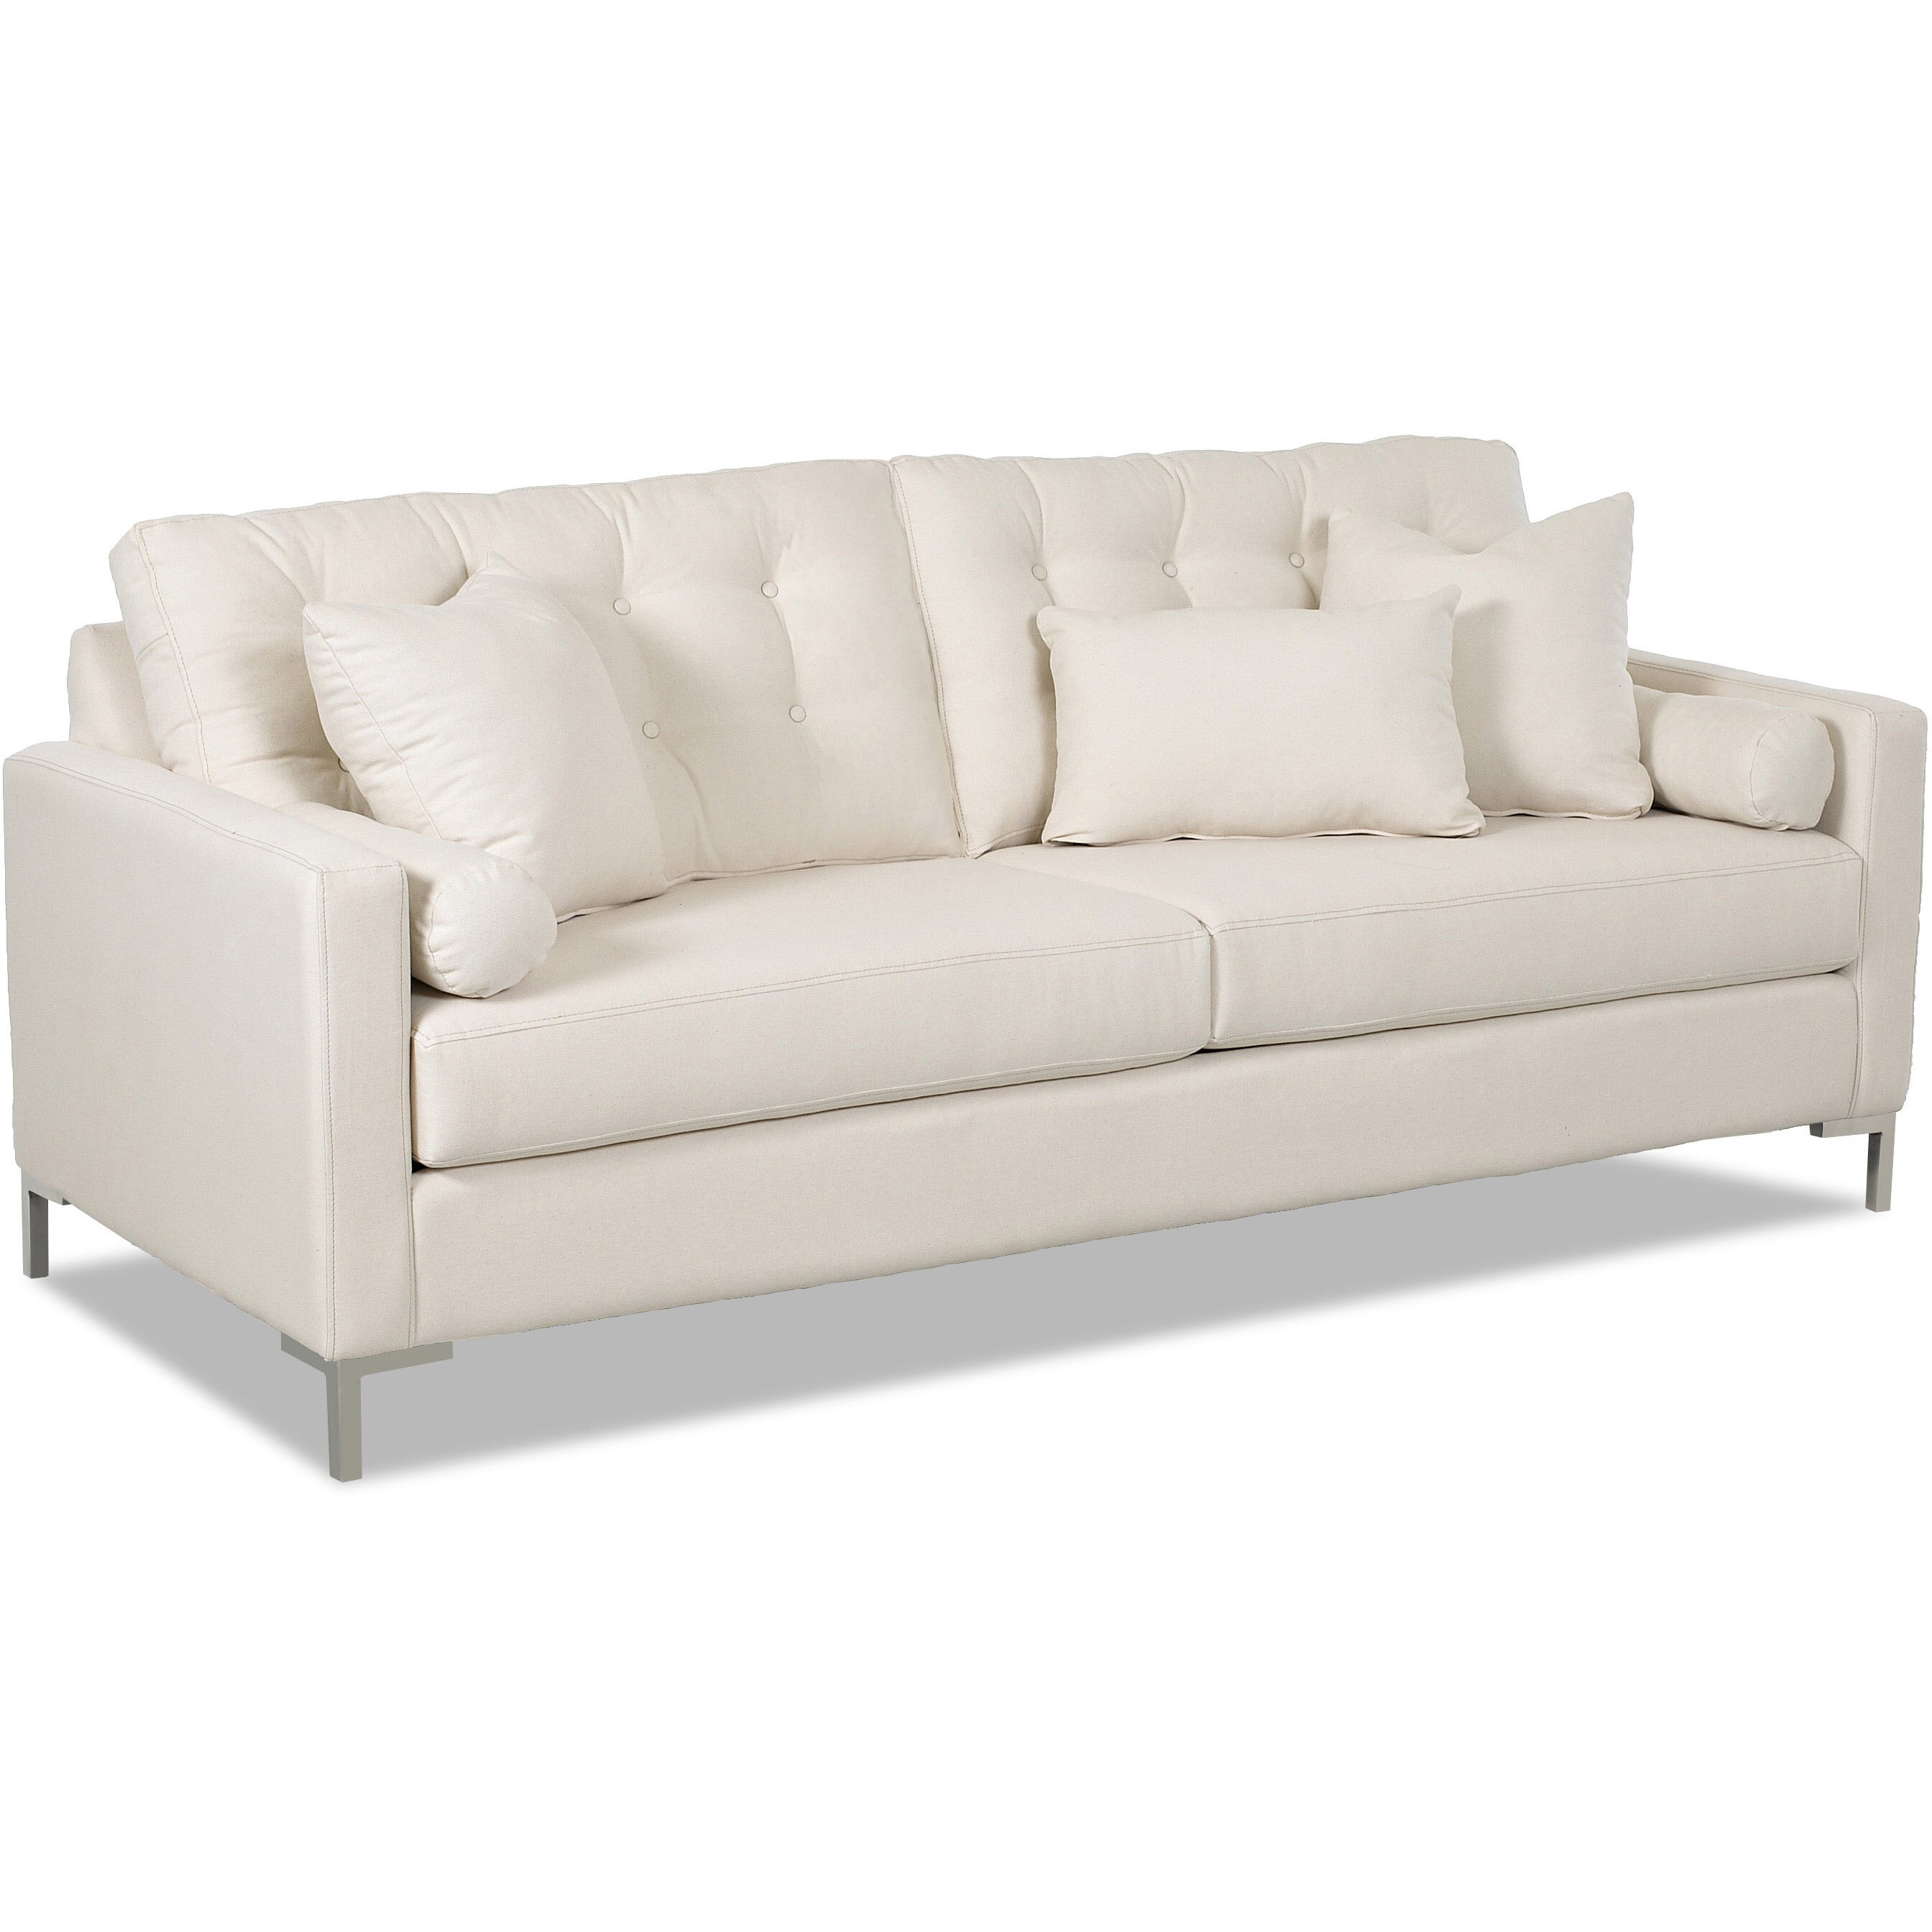 Wayfair Custom Upholstery Harper Sofa With Metal Legs